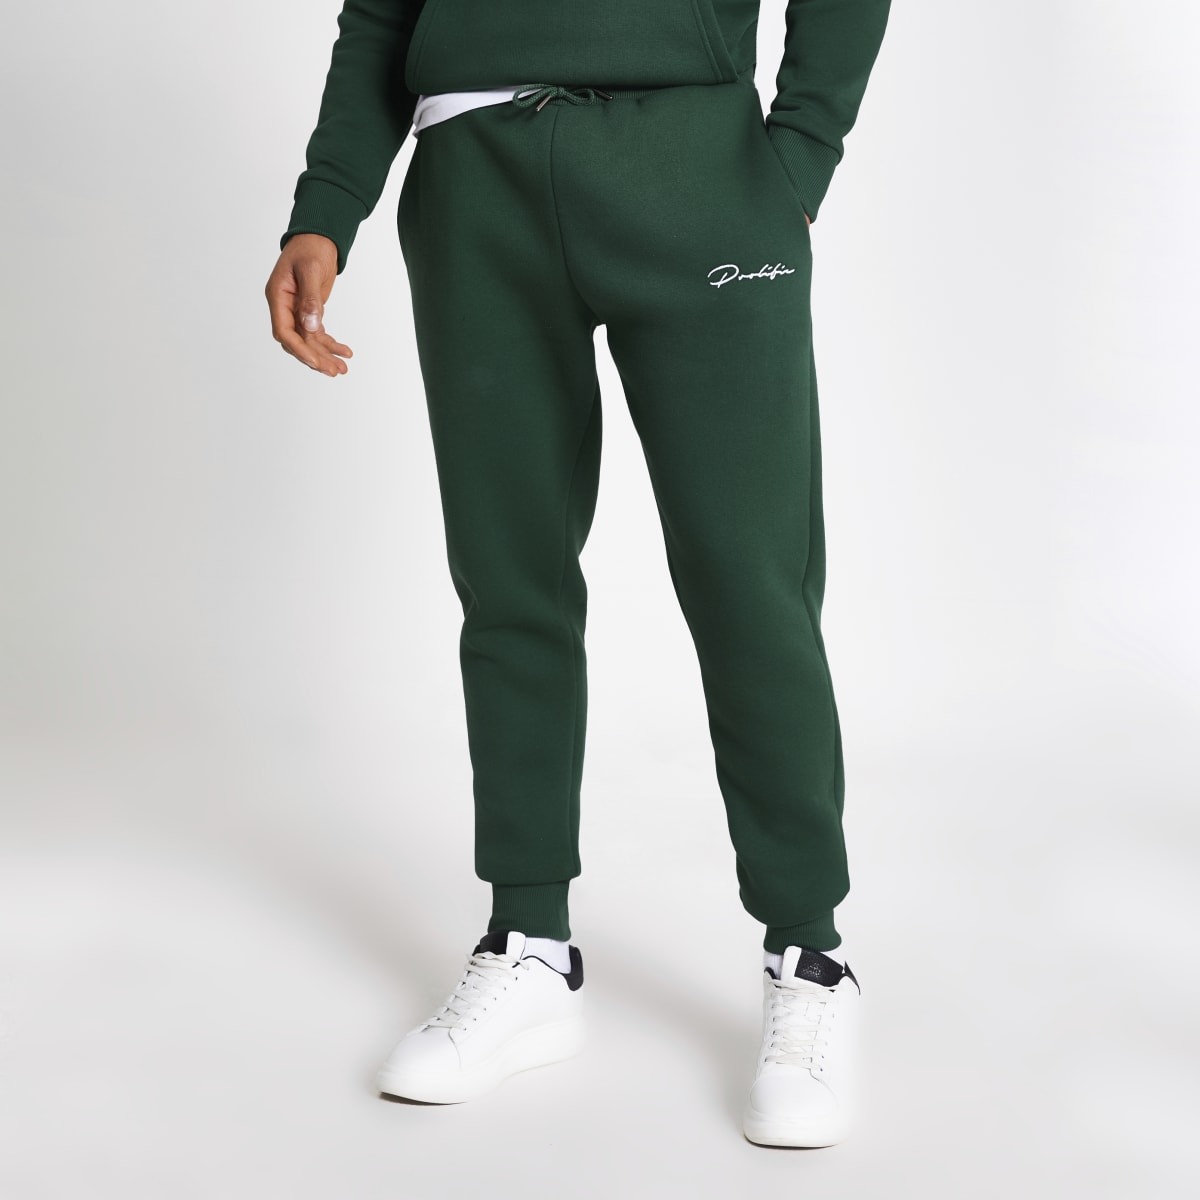 Prolific - Donkergroene slim-fit joggingbroek